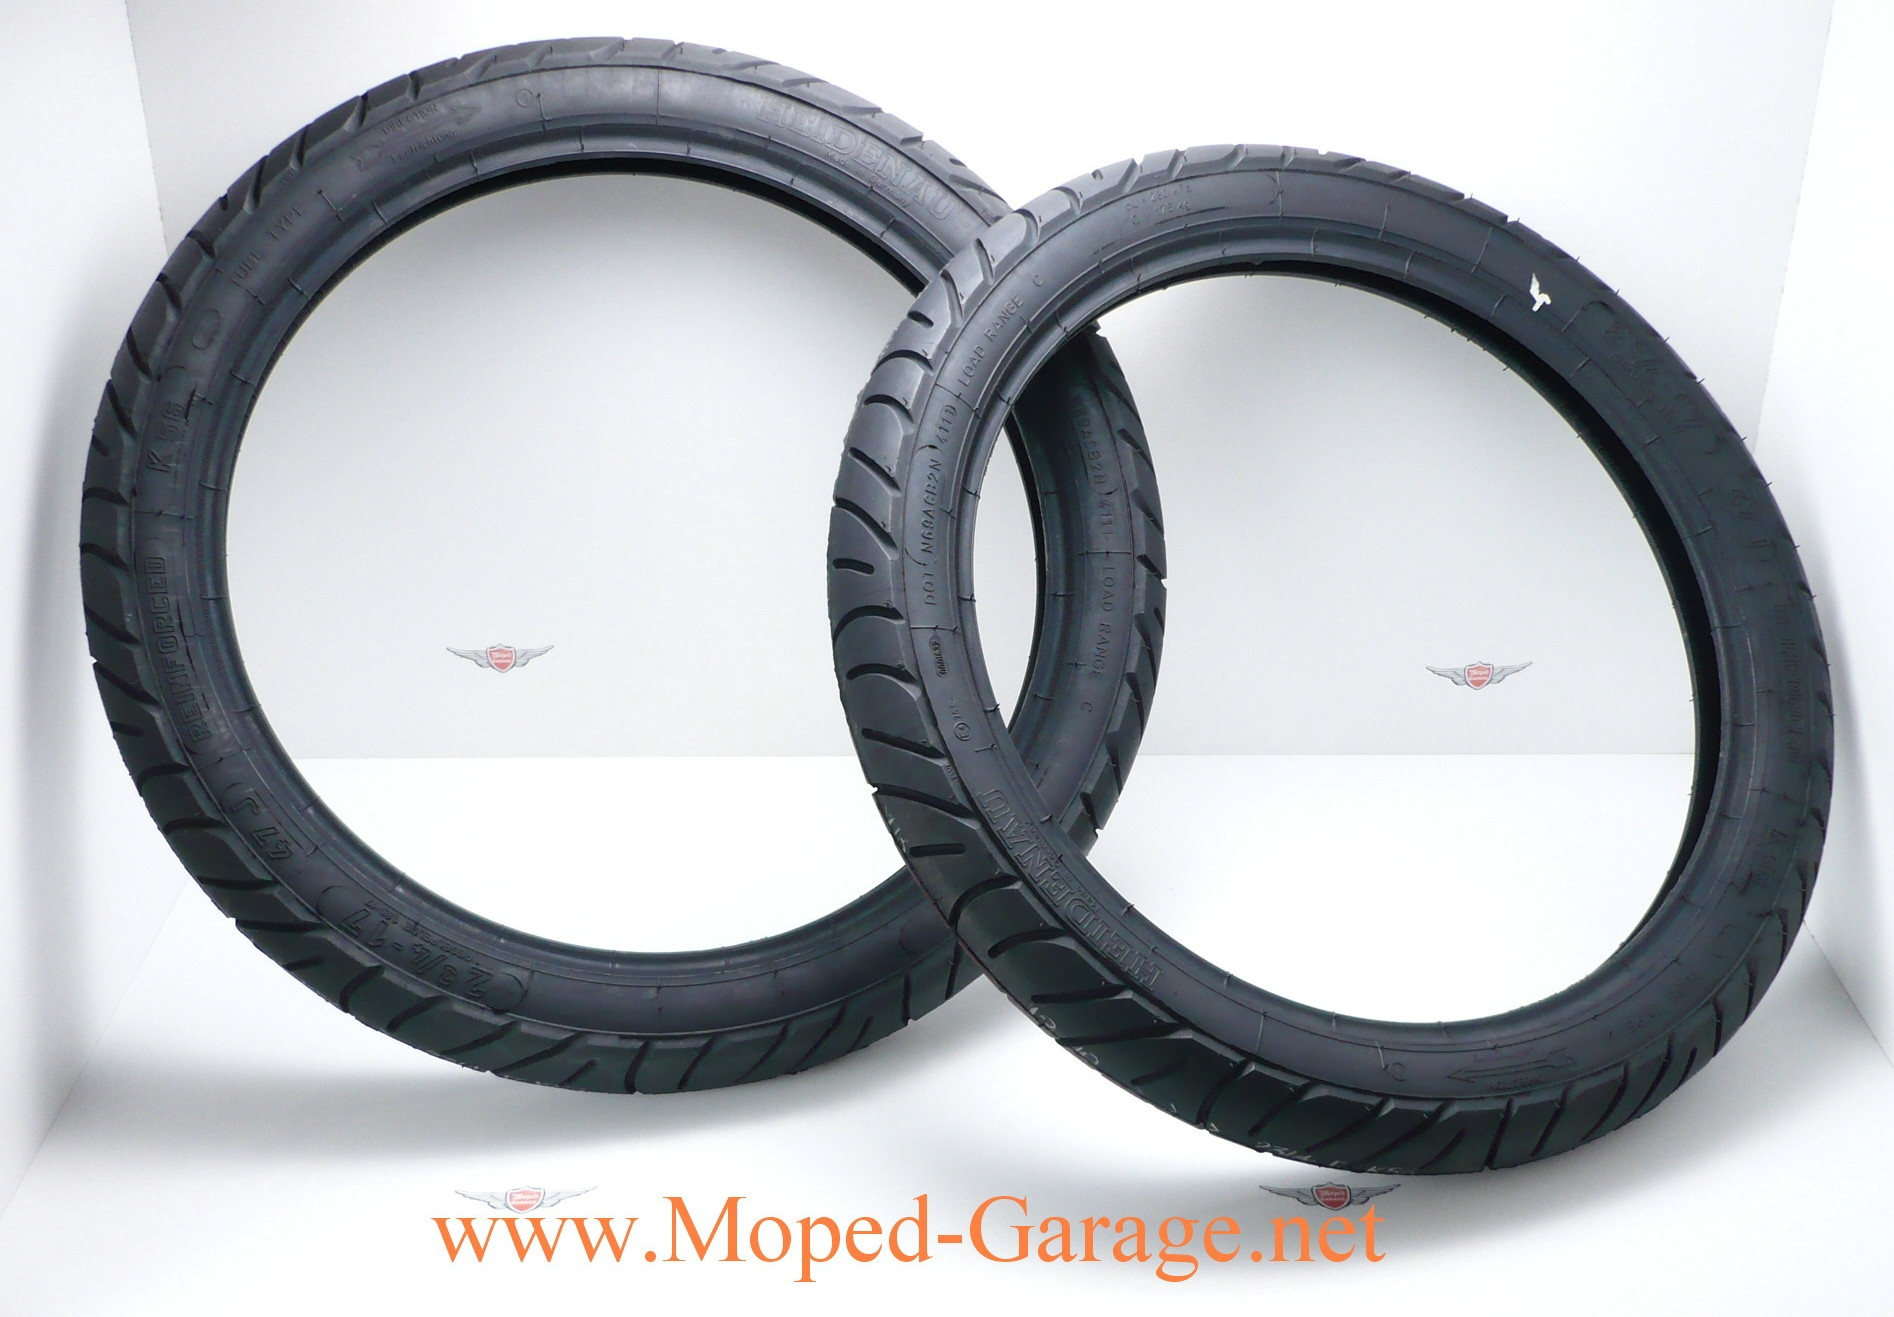 Details zu Puch Cobra Monza Mokick 9 Km/h Race Renn Reifen Set Heidenau  9 Zoll Neu*